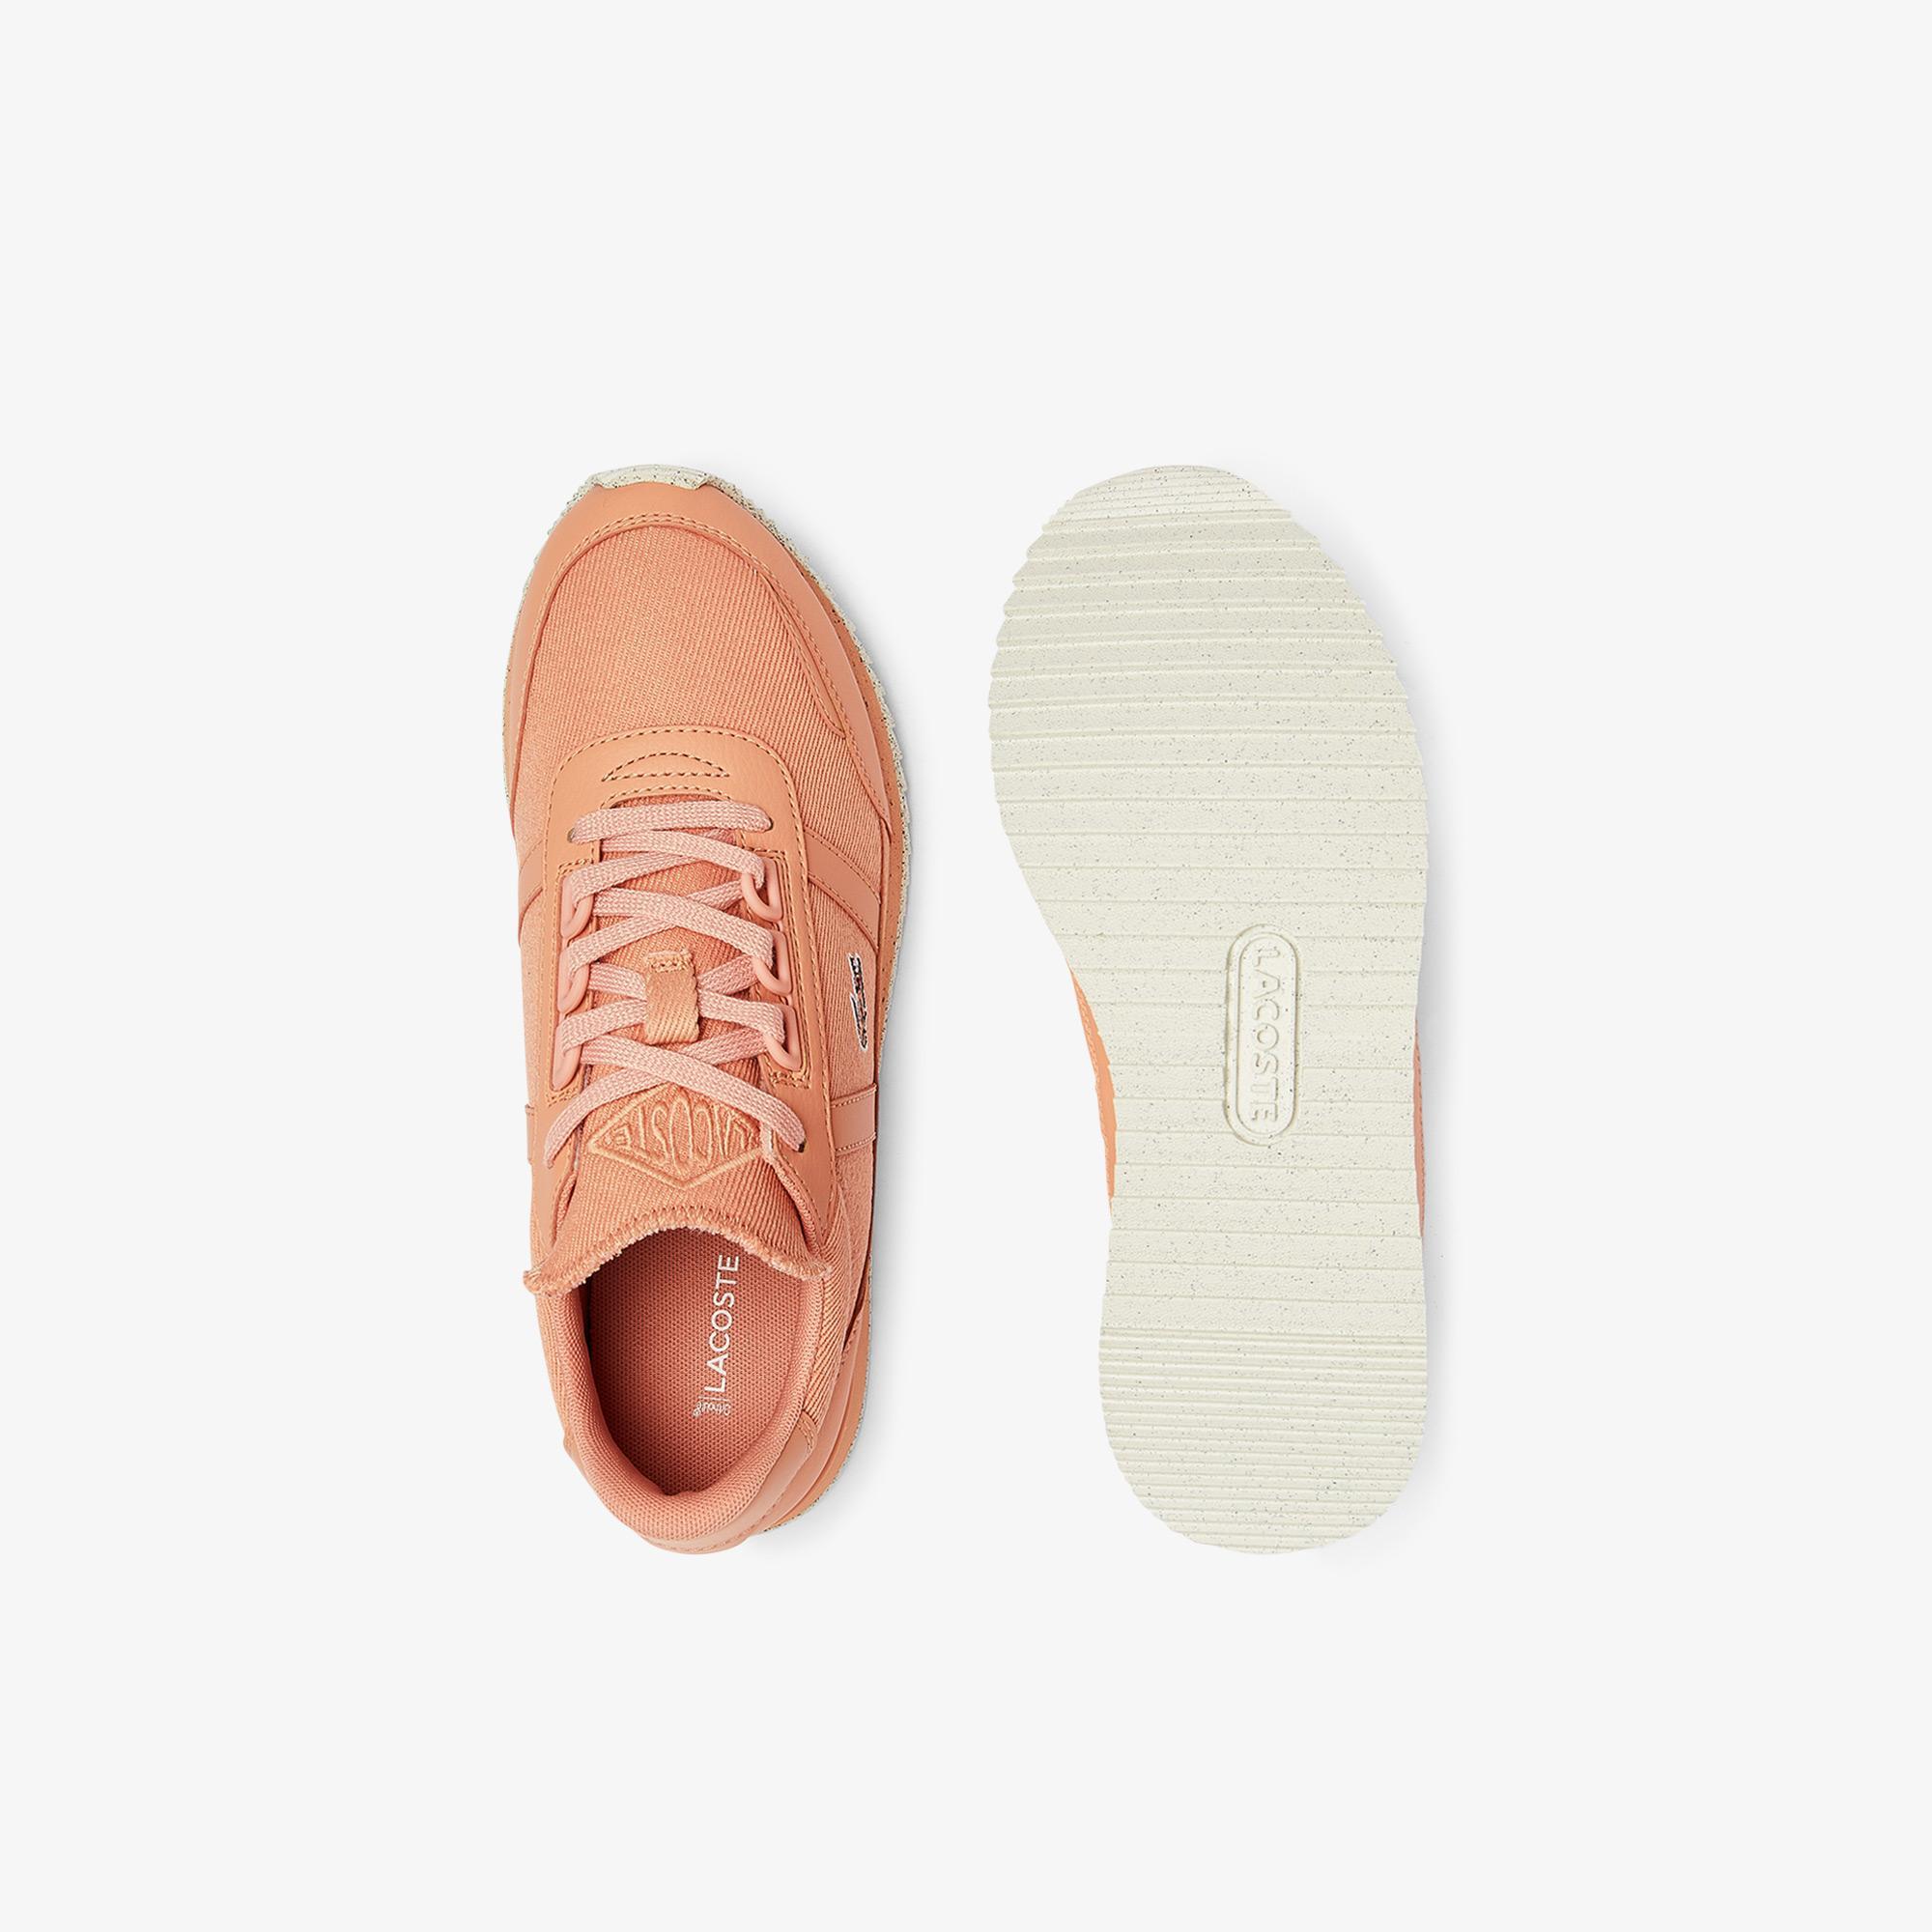 Lacoste Women's Partner Retro 0921 1 Sfa Shoes